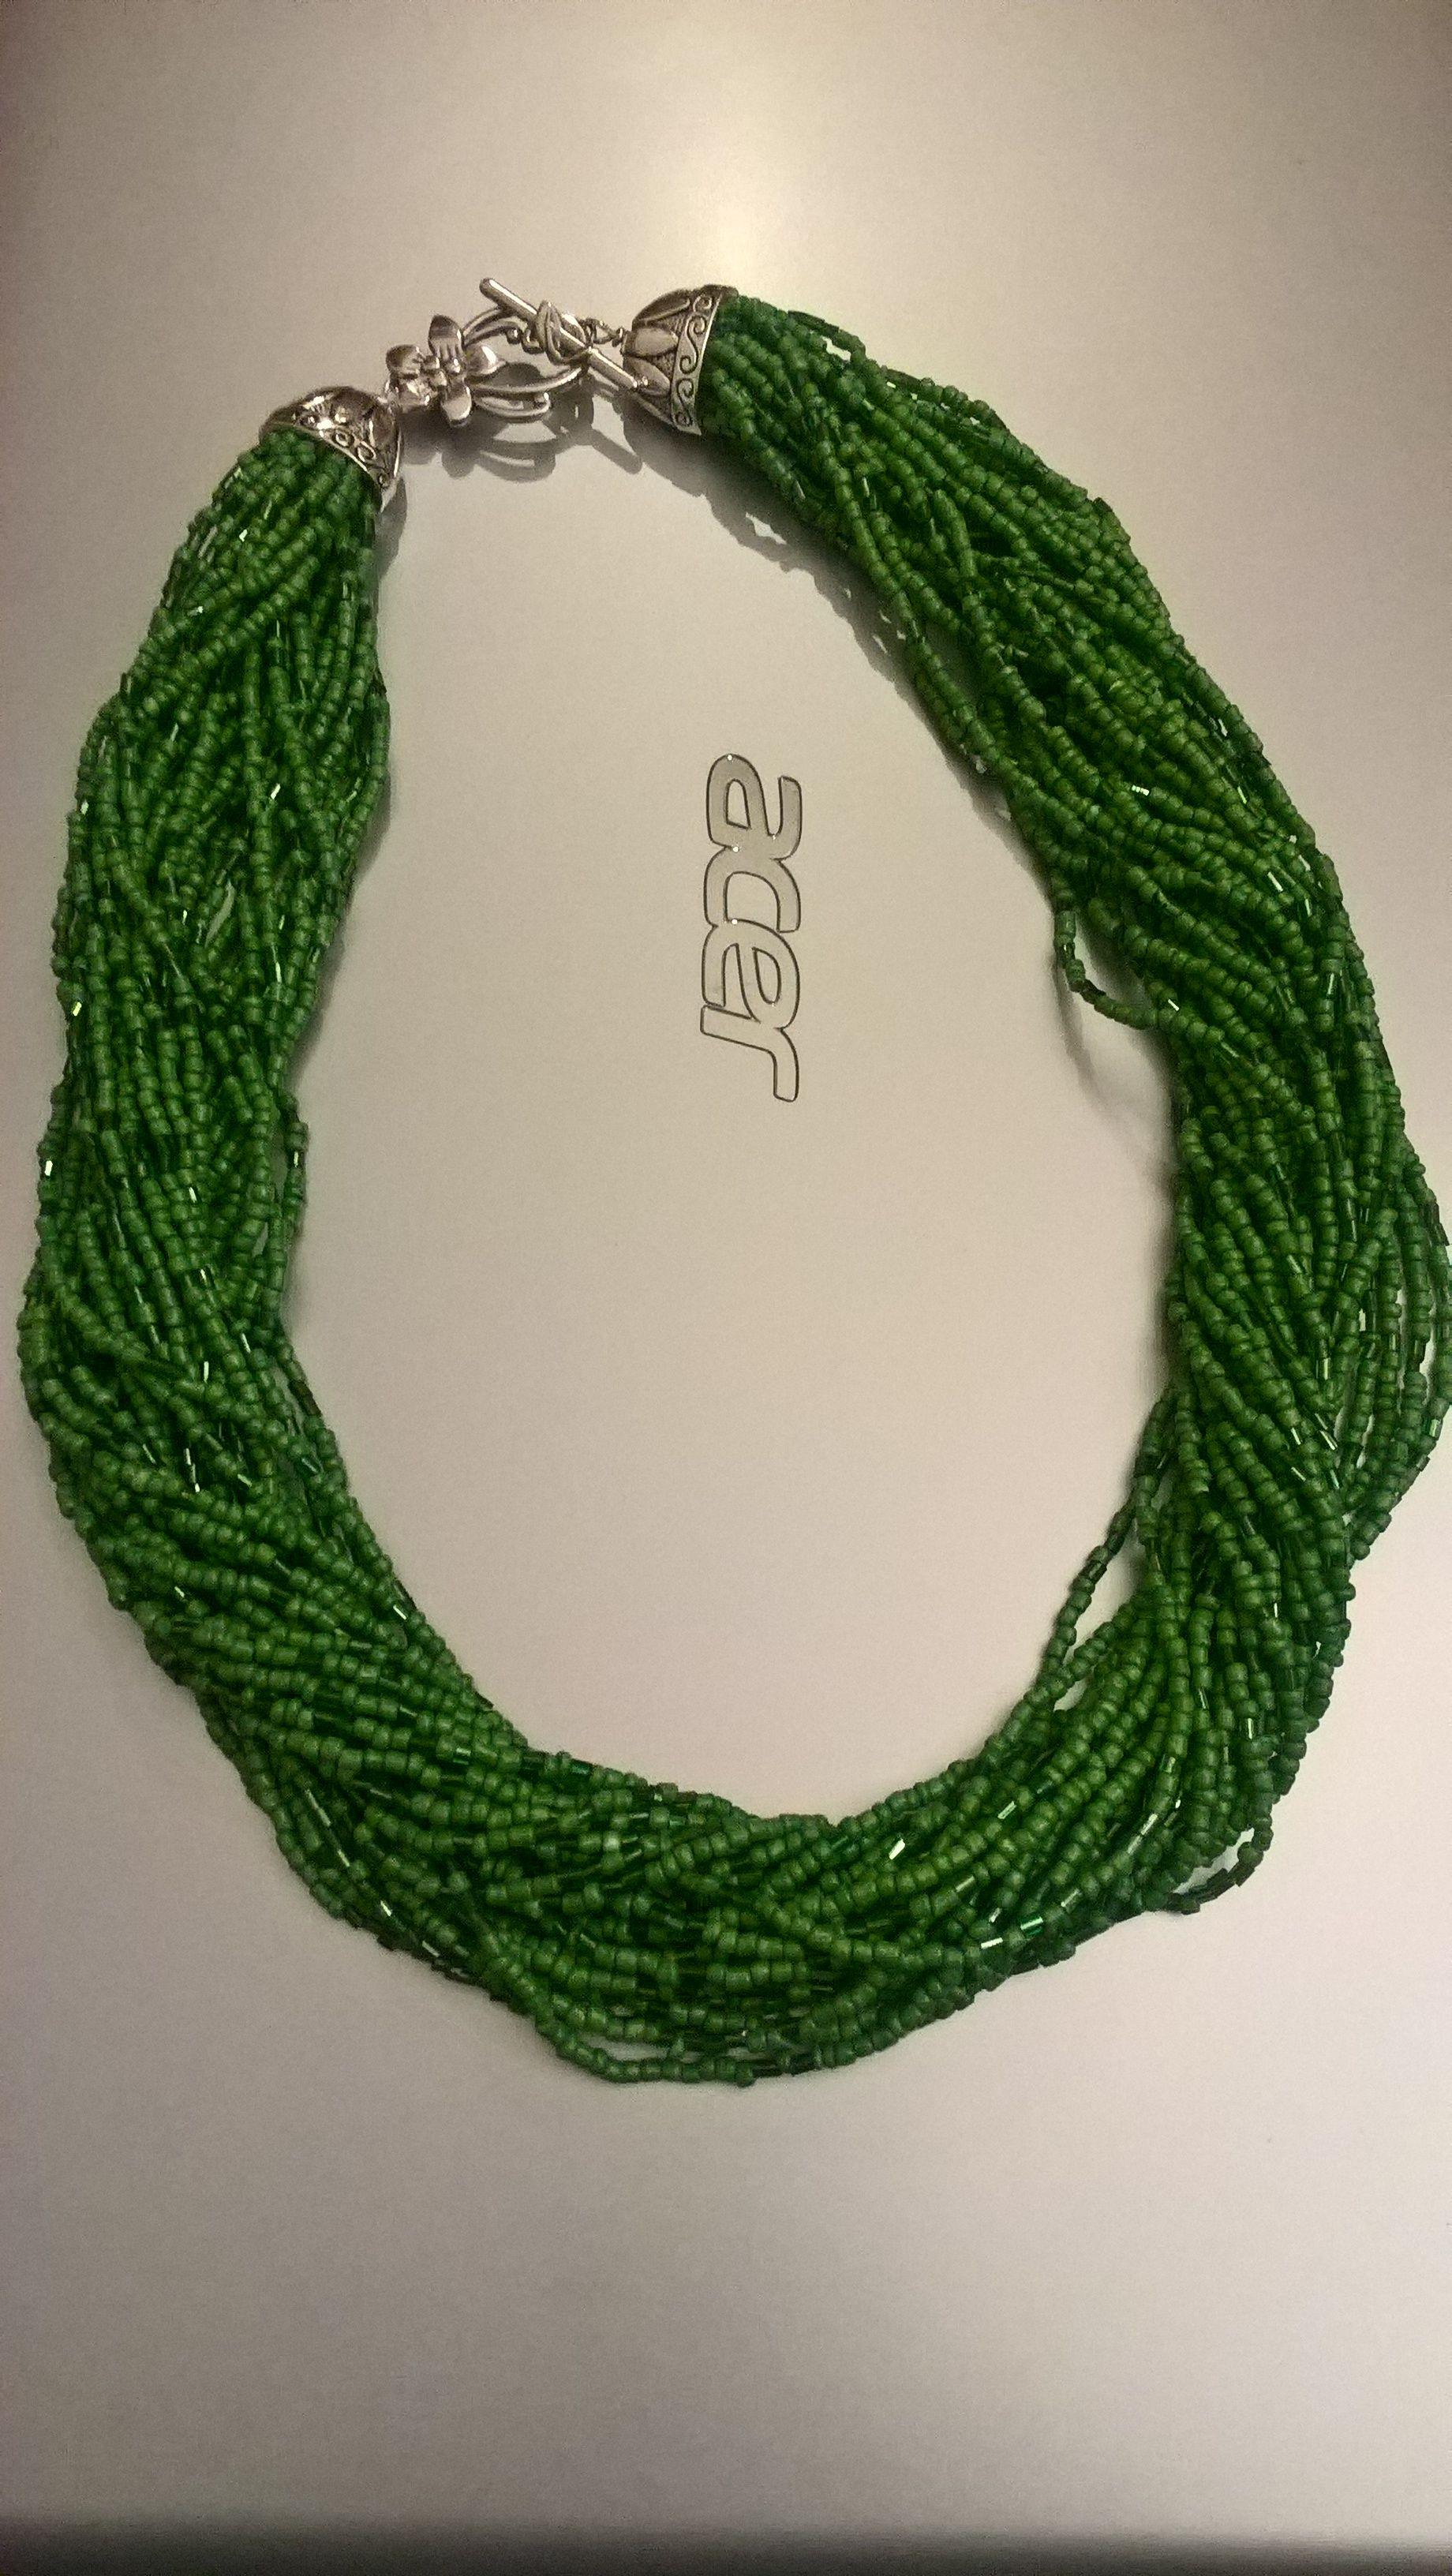 Popolare Collana verde smeraldo,Terry Tanti | Collana verde, Collane WG69